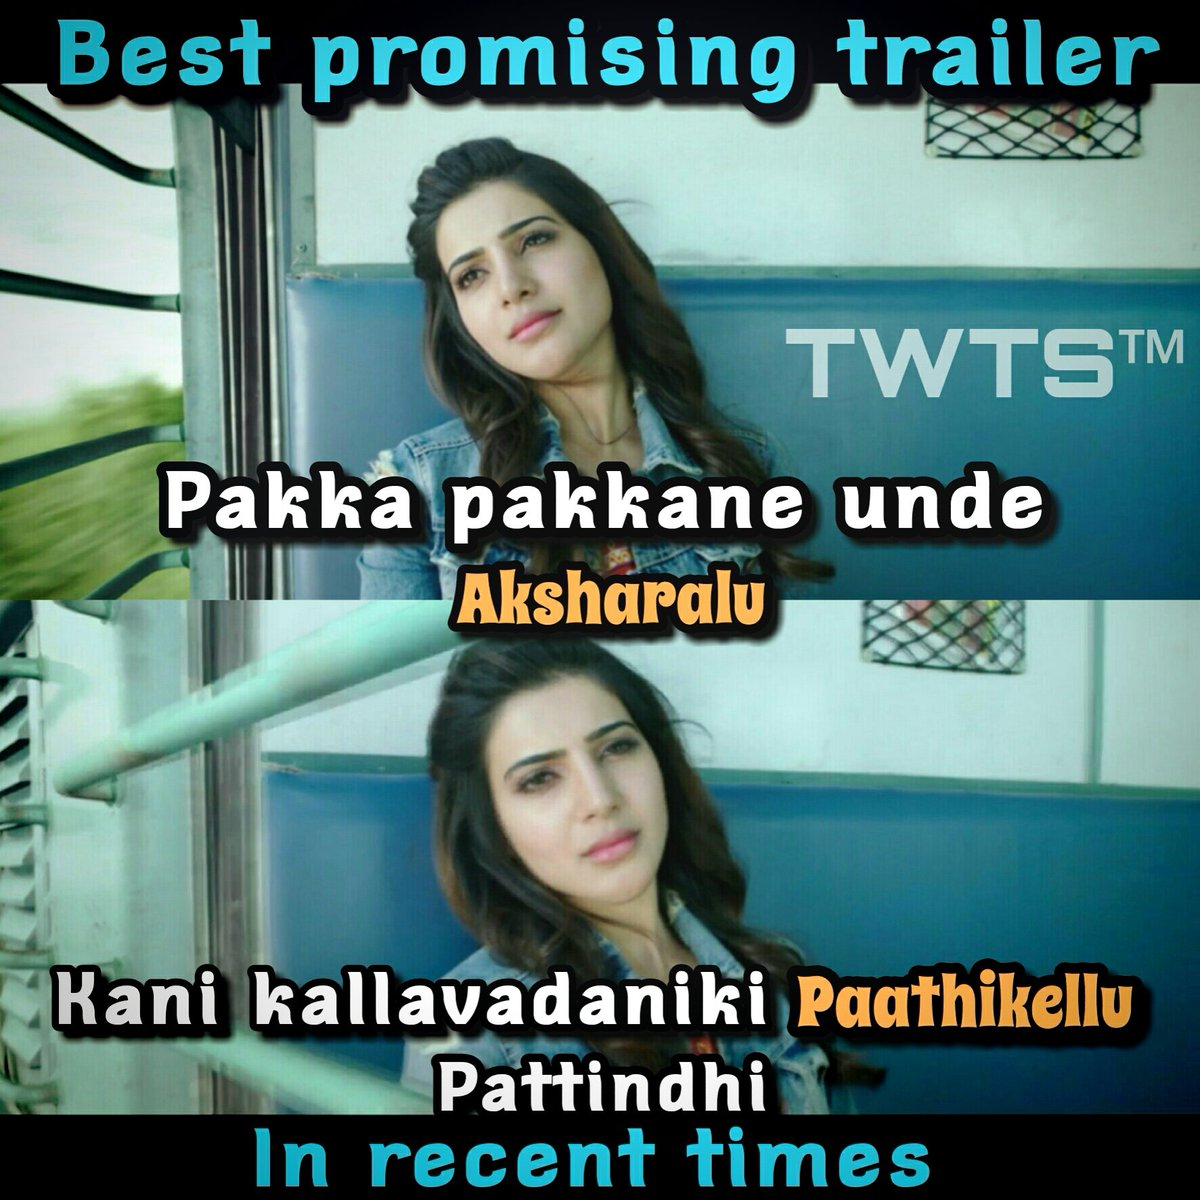 Best Promising Trailer in Recent Times #June2 #2k16 #AAaPremieronZtelugu @Samanthaprabhu2 #TrivikramCelluloid #TWTS™<br>http://pic.twitter.com/cxawwBSGVc